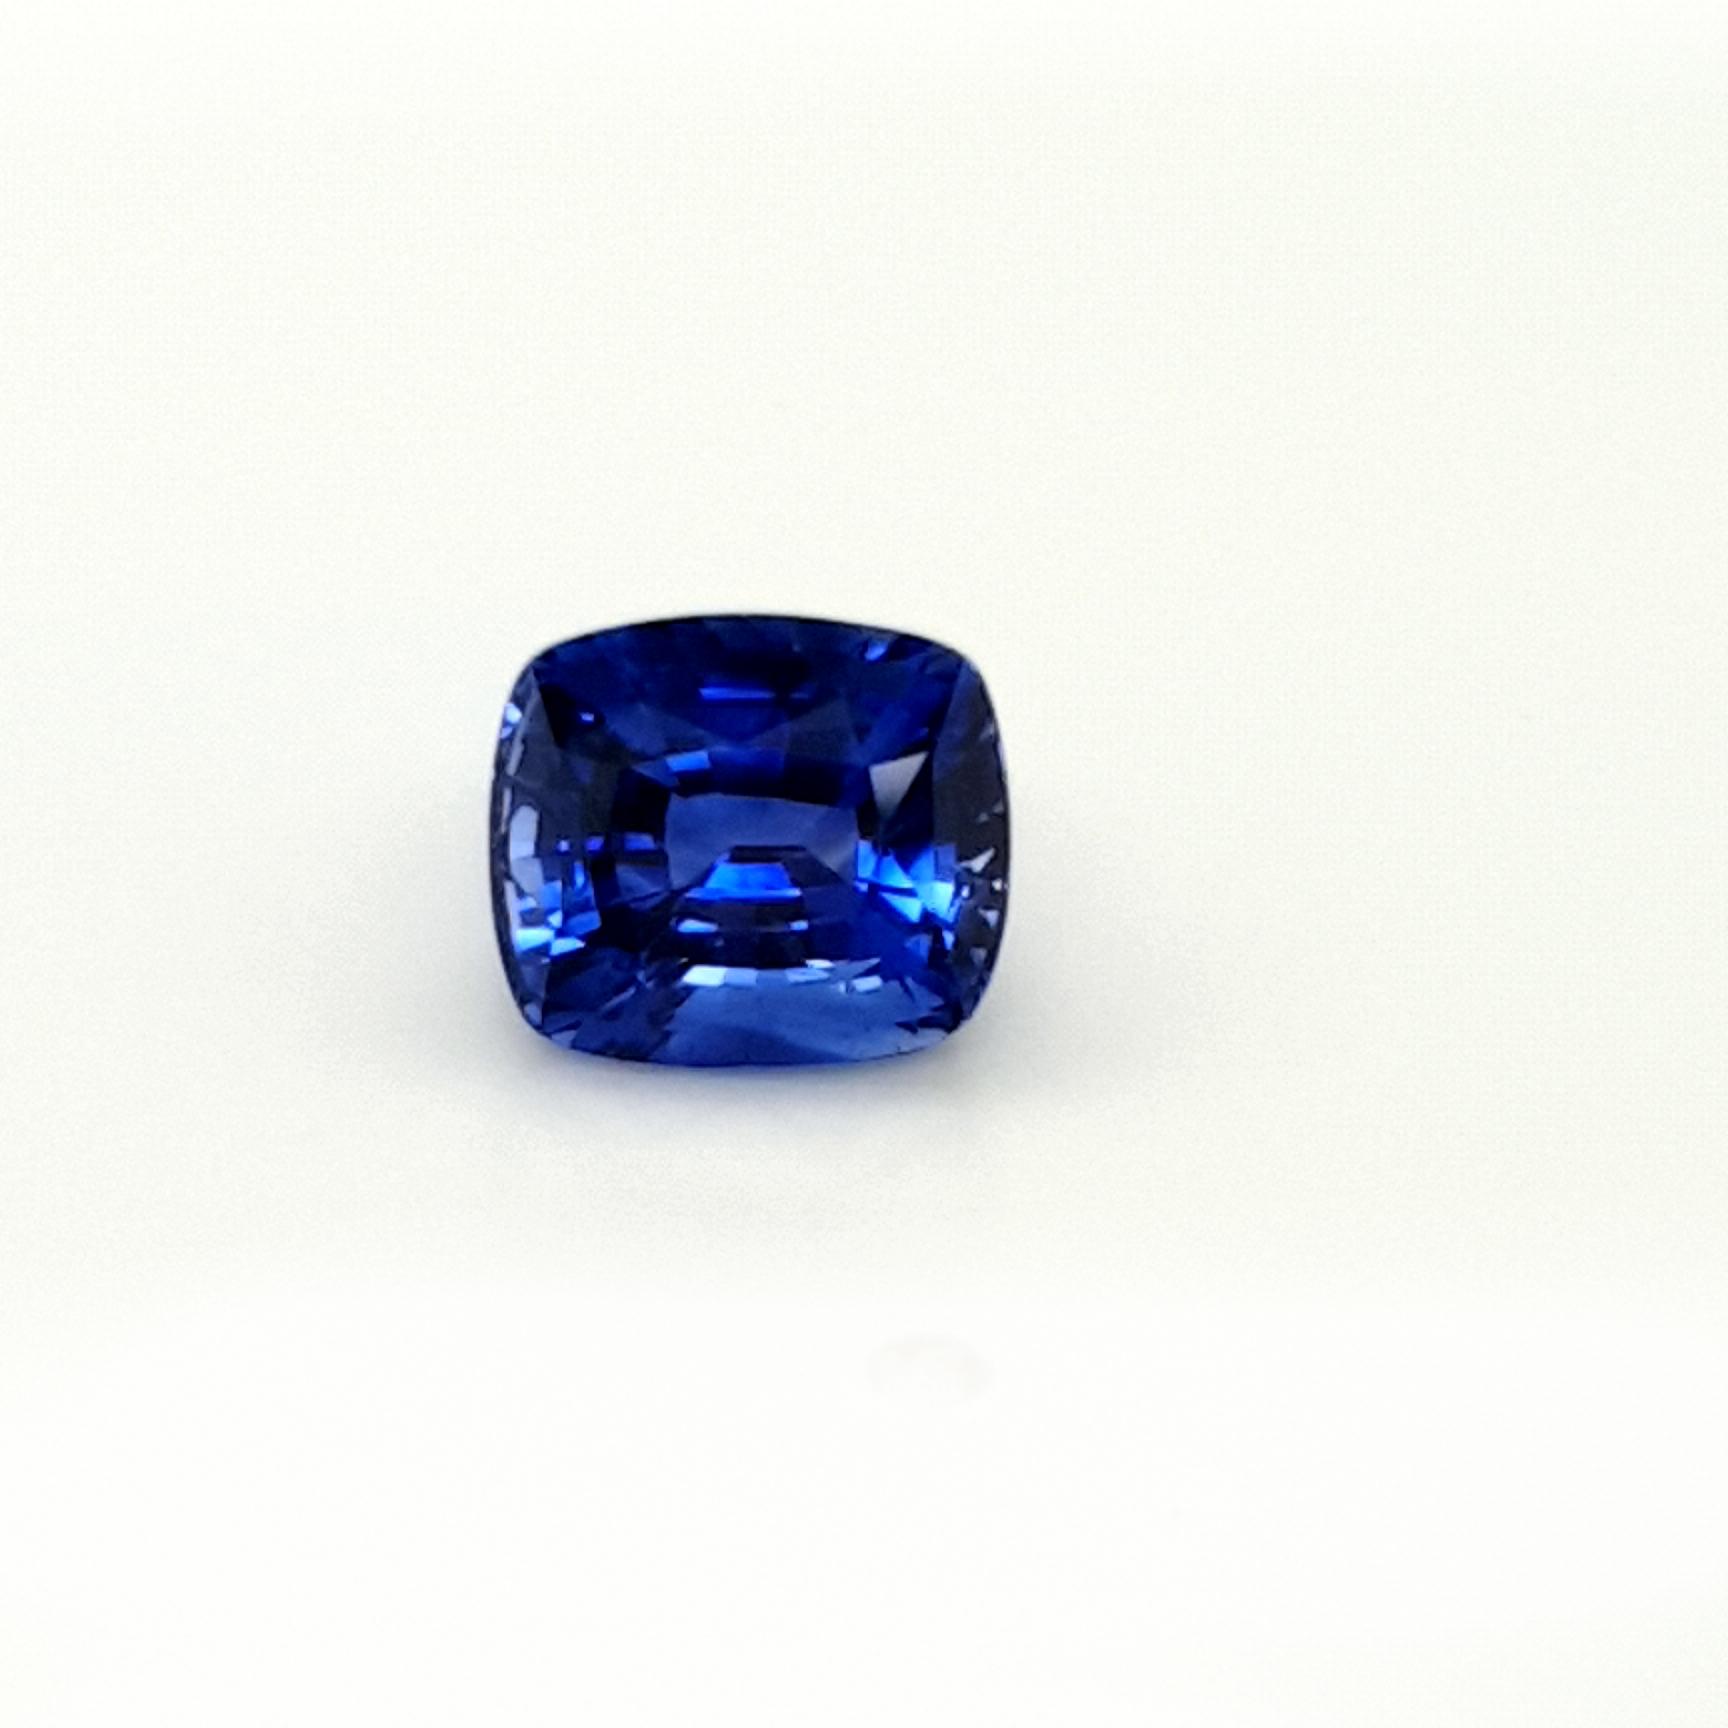 3,67ct. Sapphire RoyalBlue SAB20D1 ClaudiaHamann__2021-06-02-14-38-34